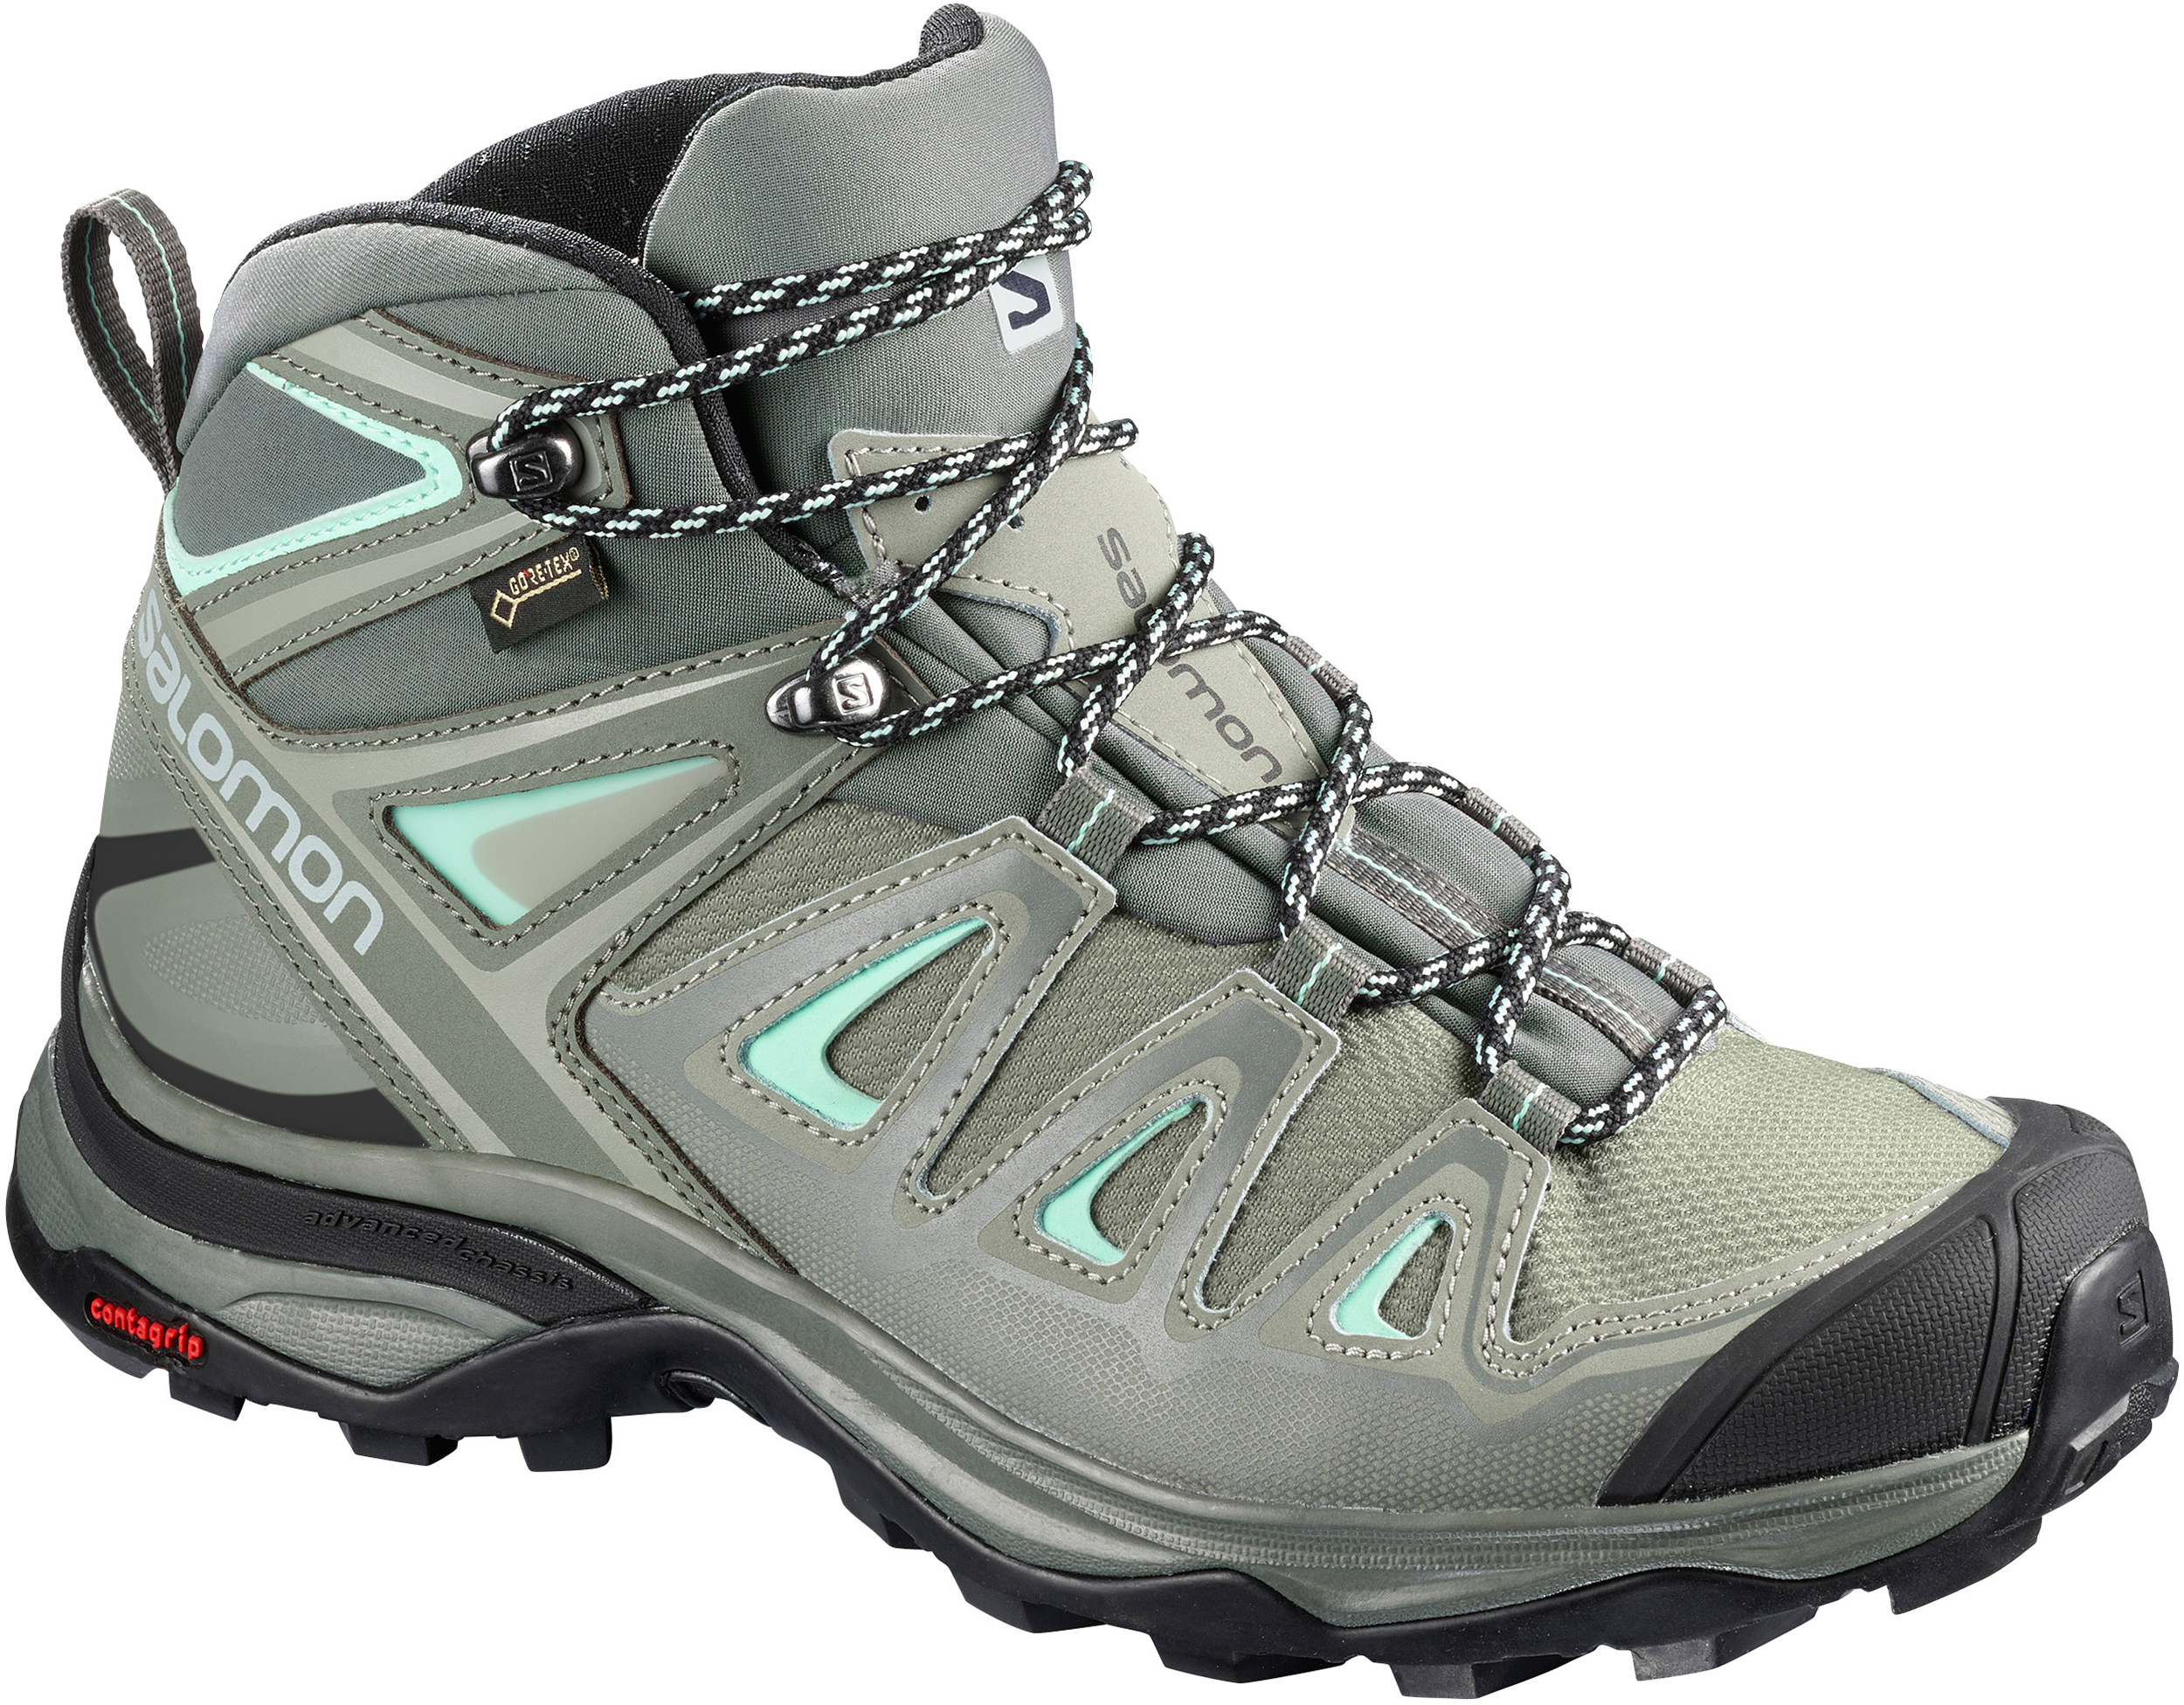 fb27db7585 Salomon X Ultra Mid 3 GTX Light Trail Shoes - Women's